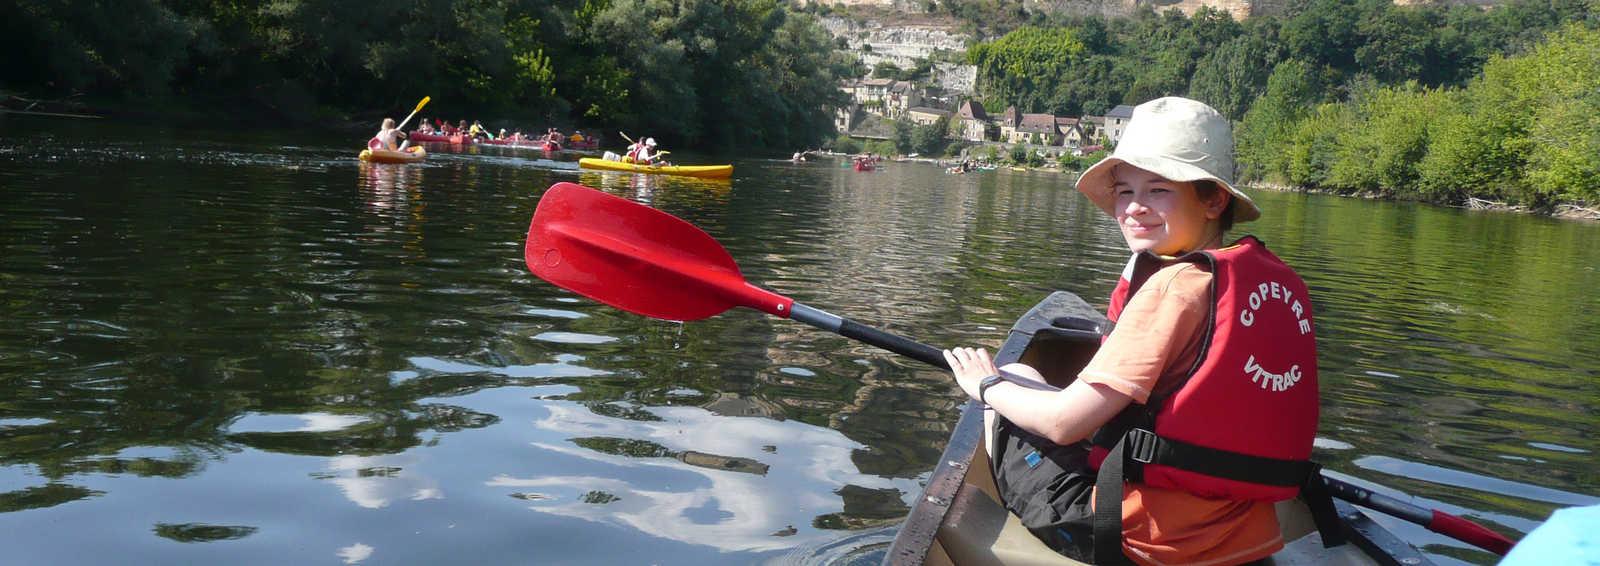 Dordogne Family Activity Week